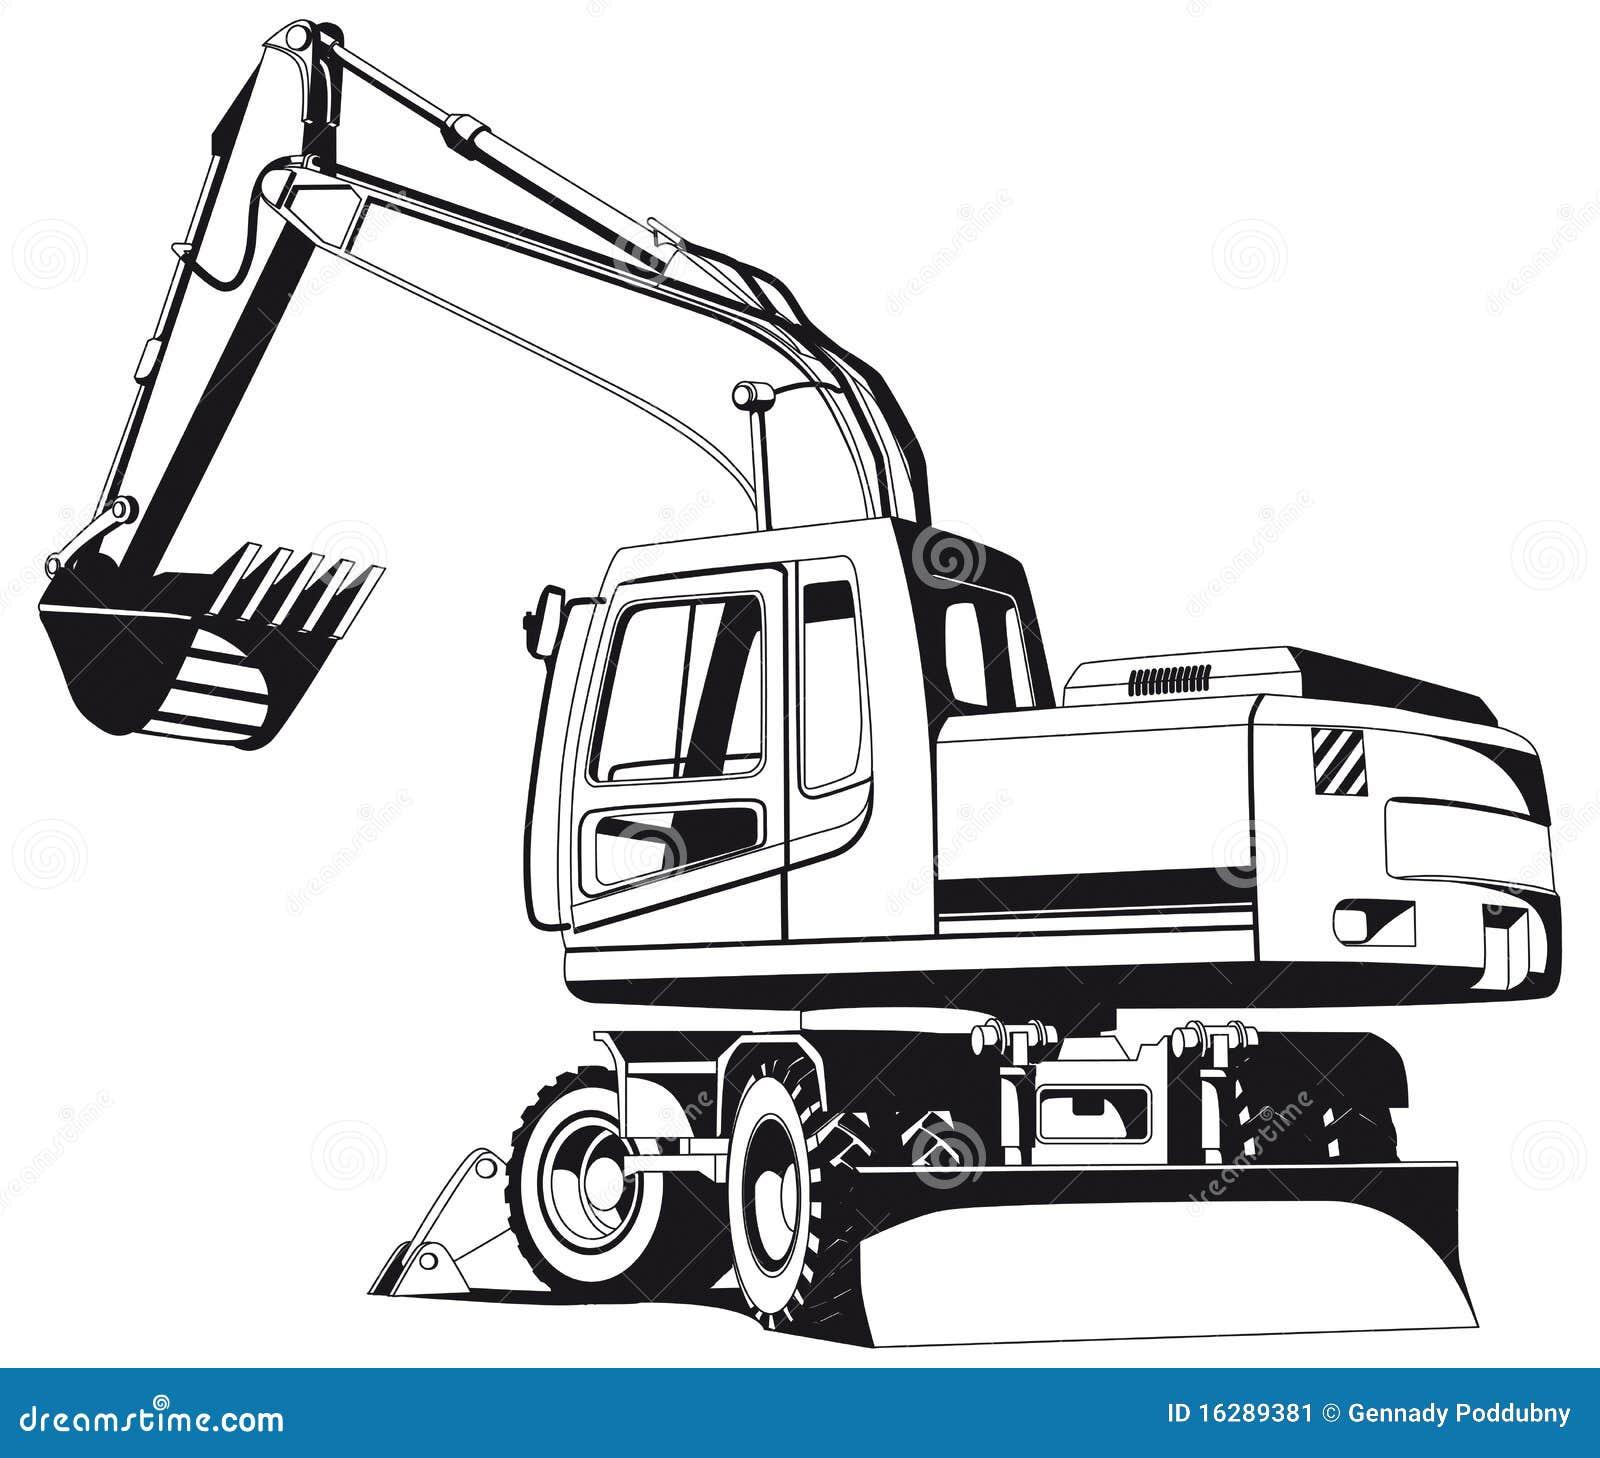 Excavator Outline Stock Vector Illustration Of Bucket